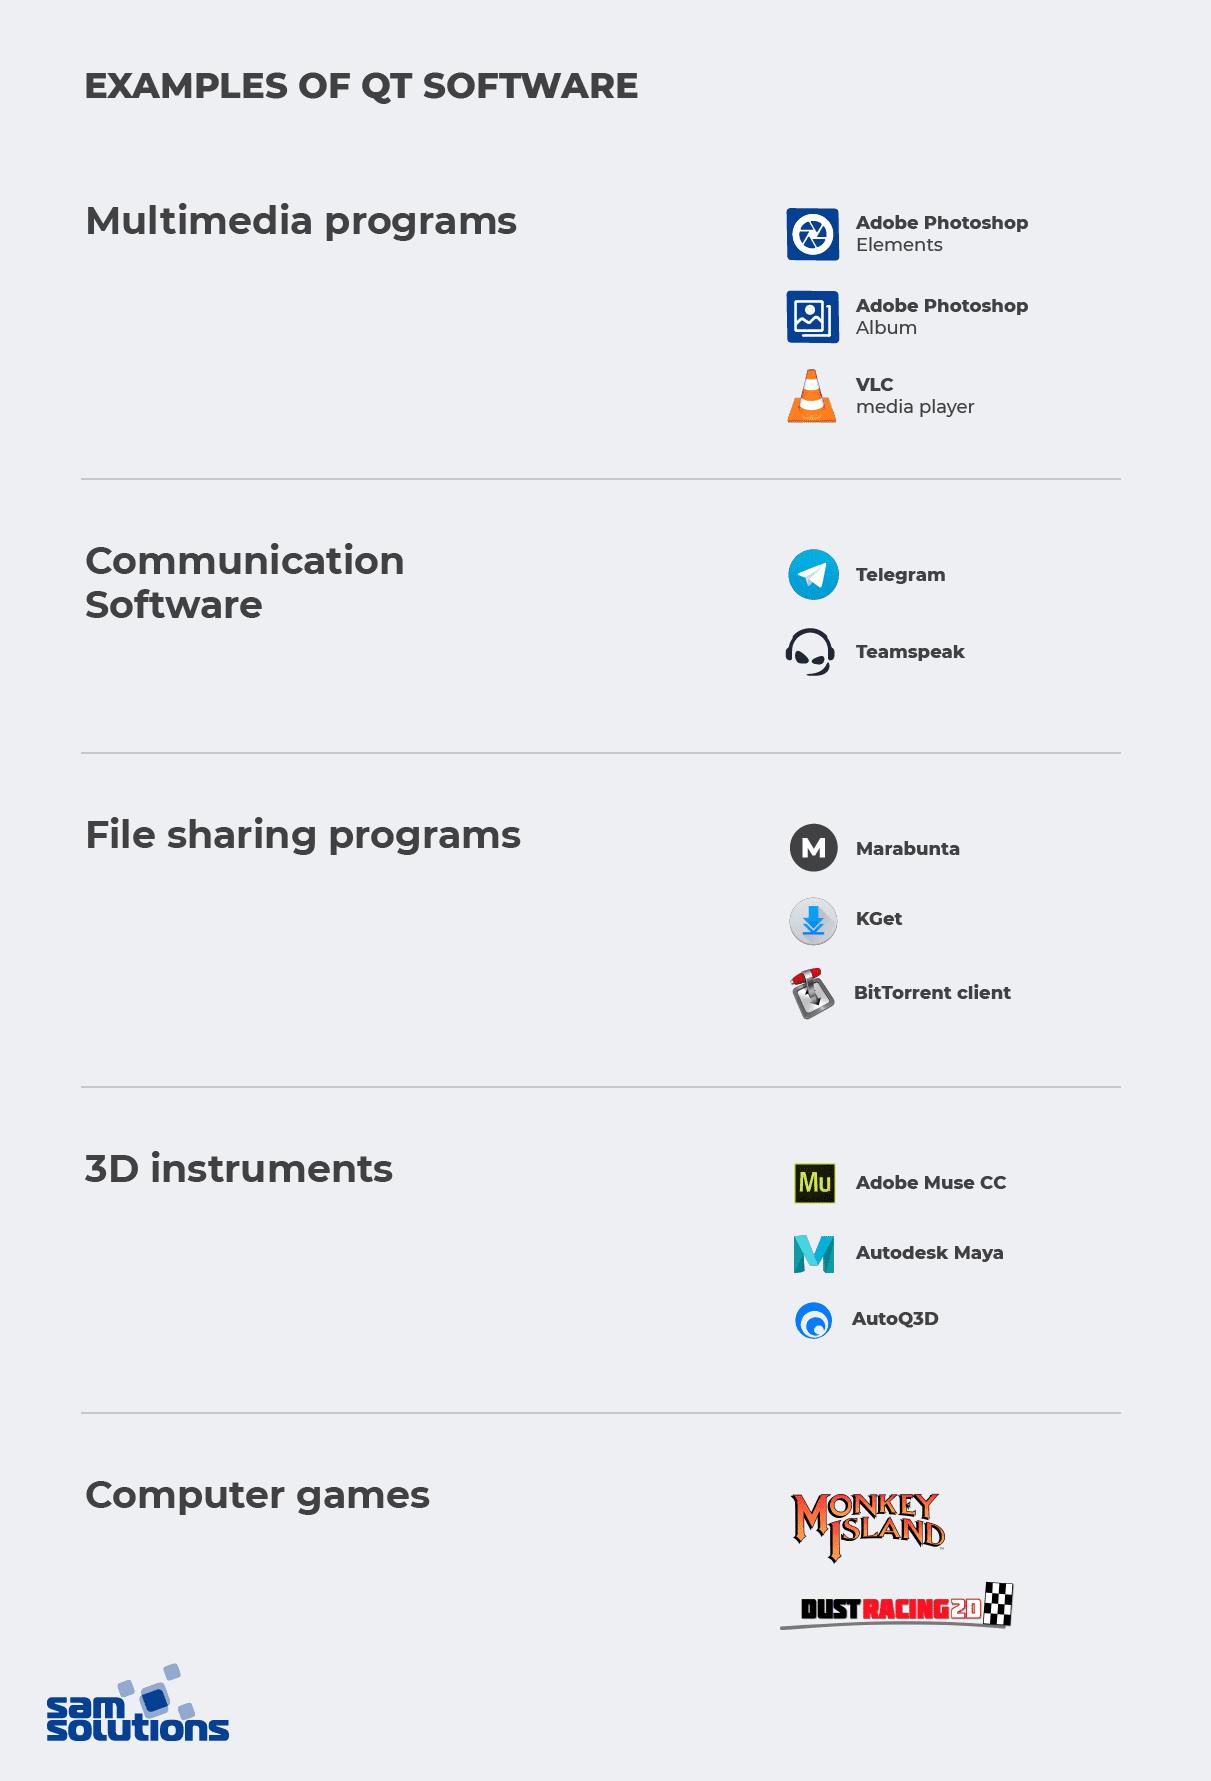 Examples-of-Qt-software